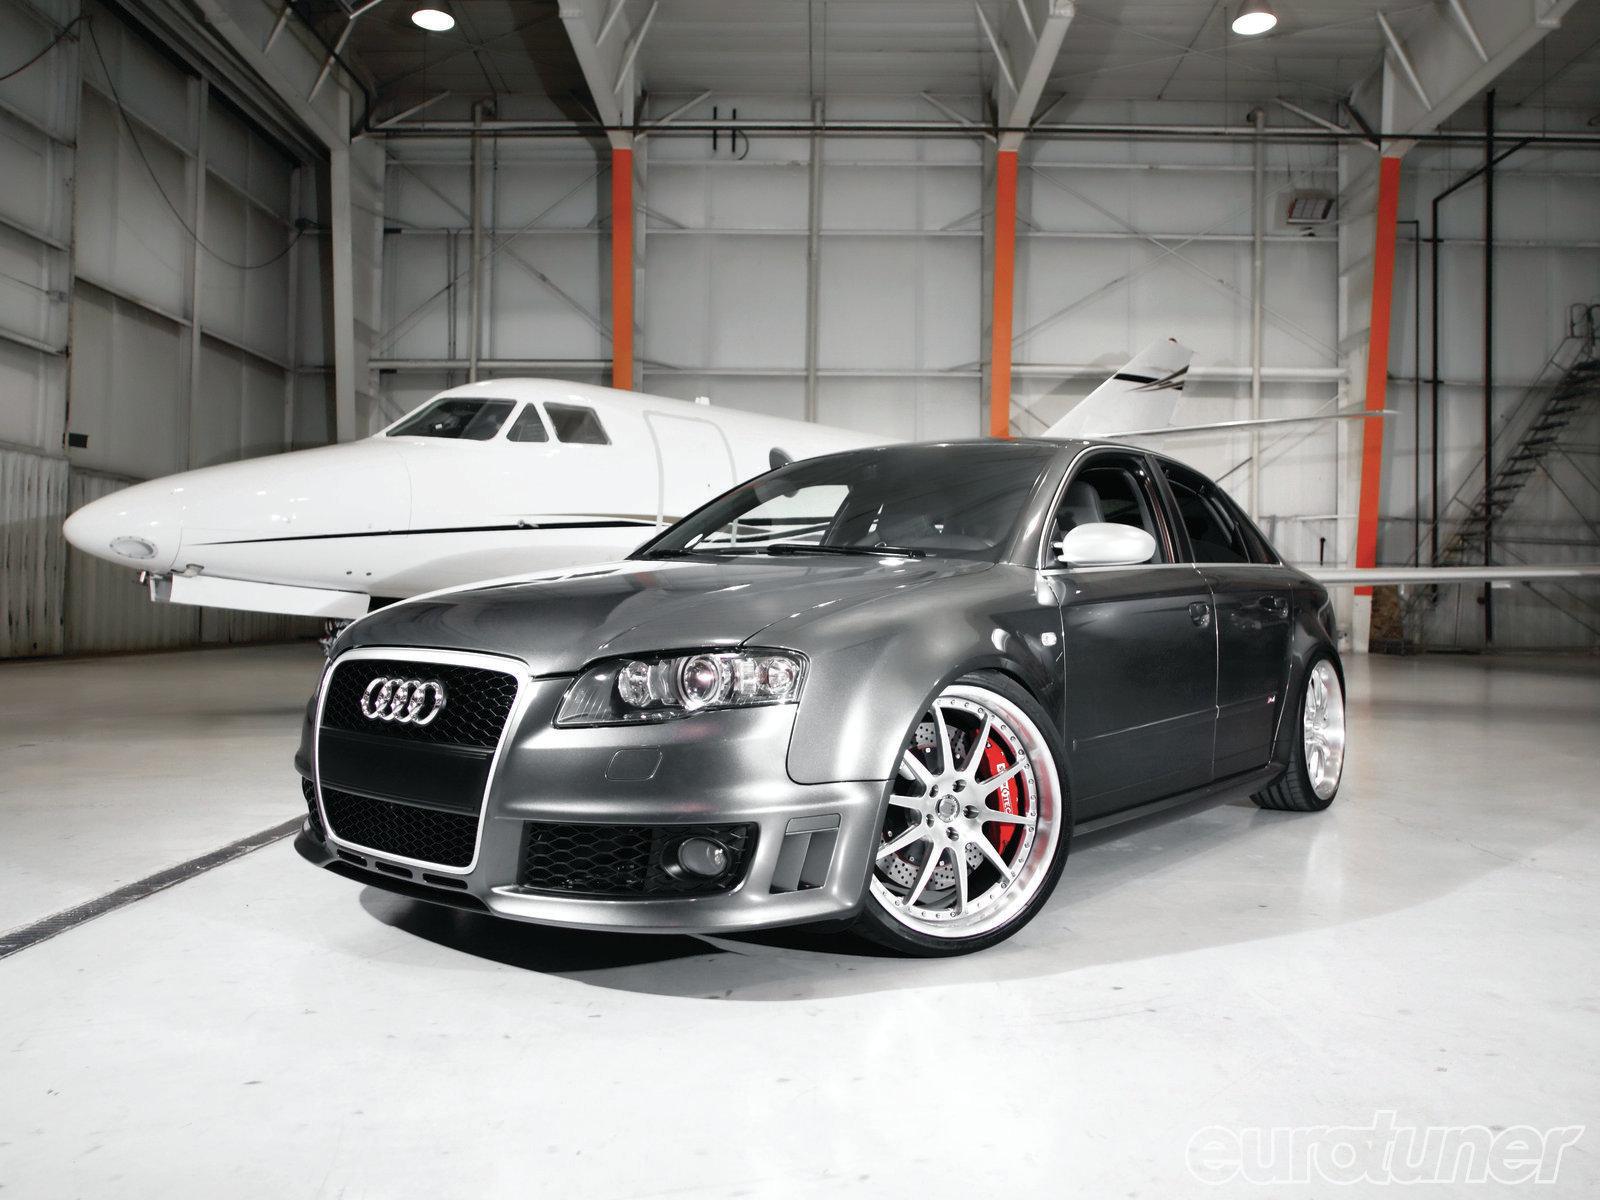 2007 Audi Rs 4 Image 15